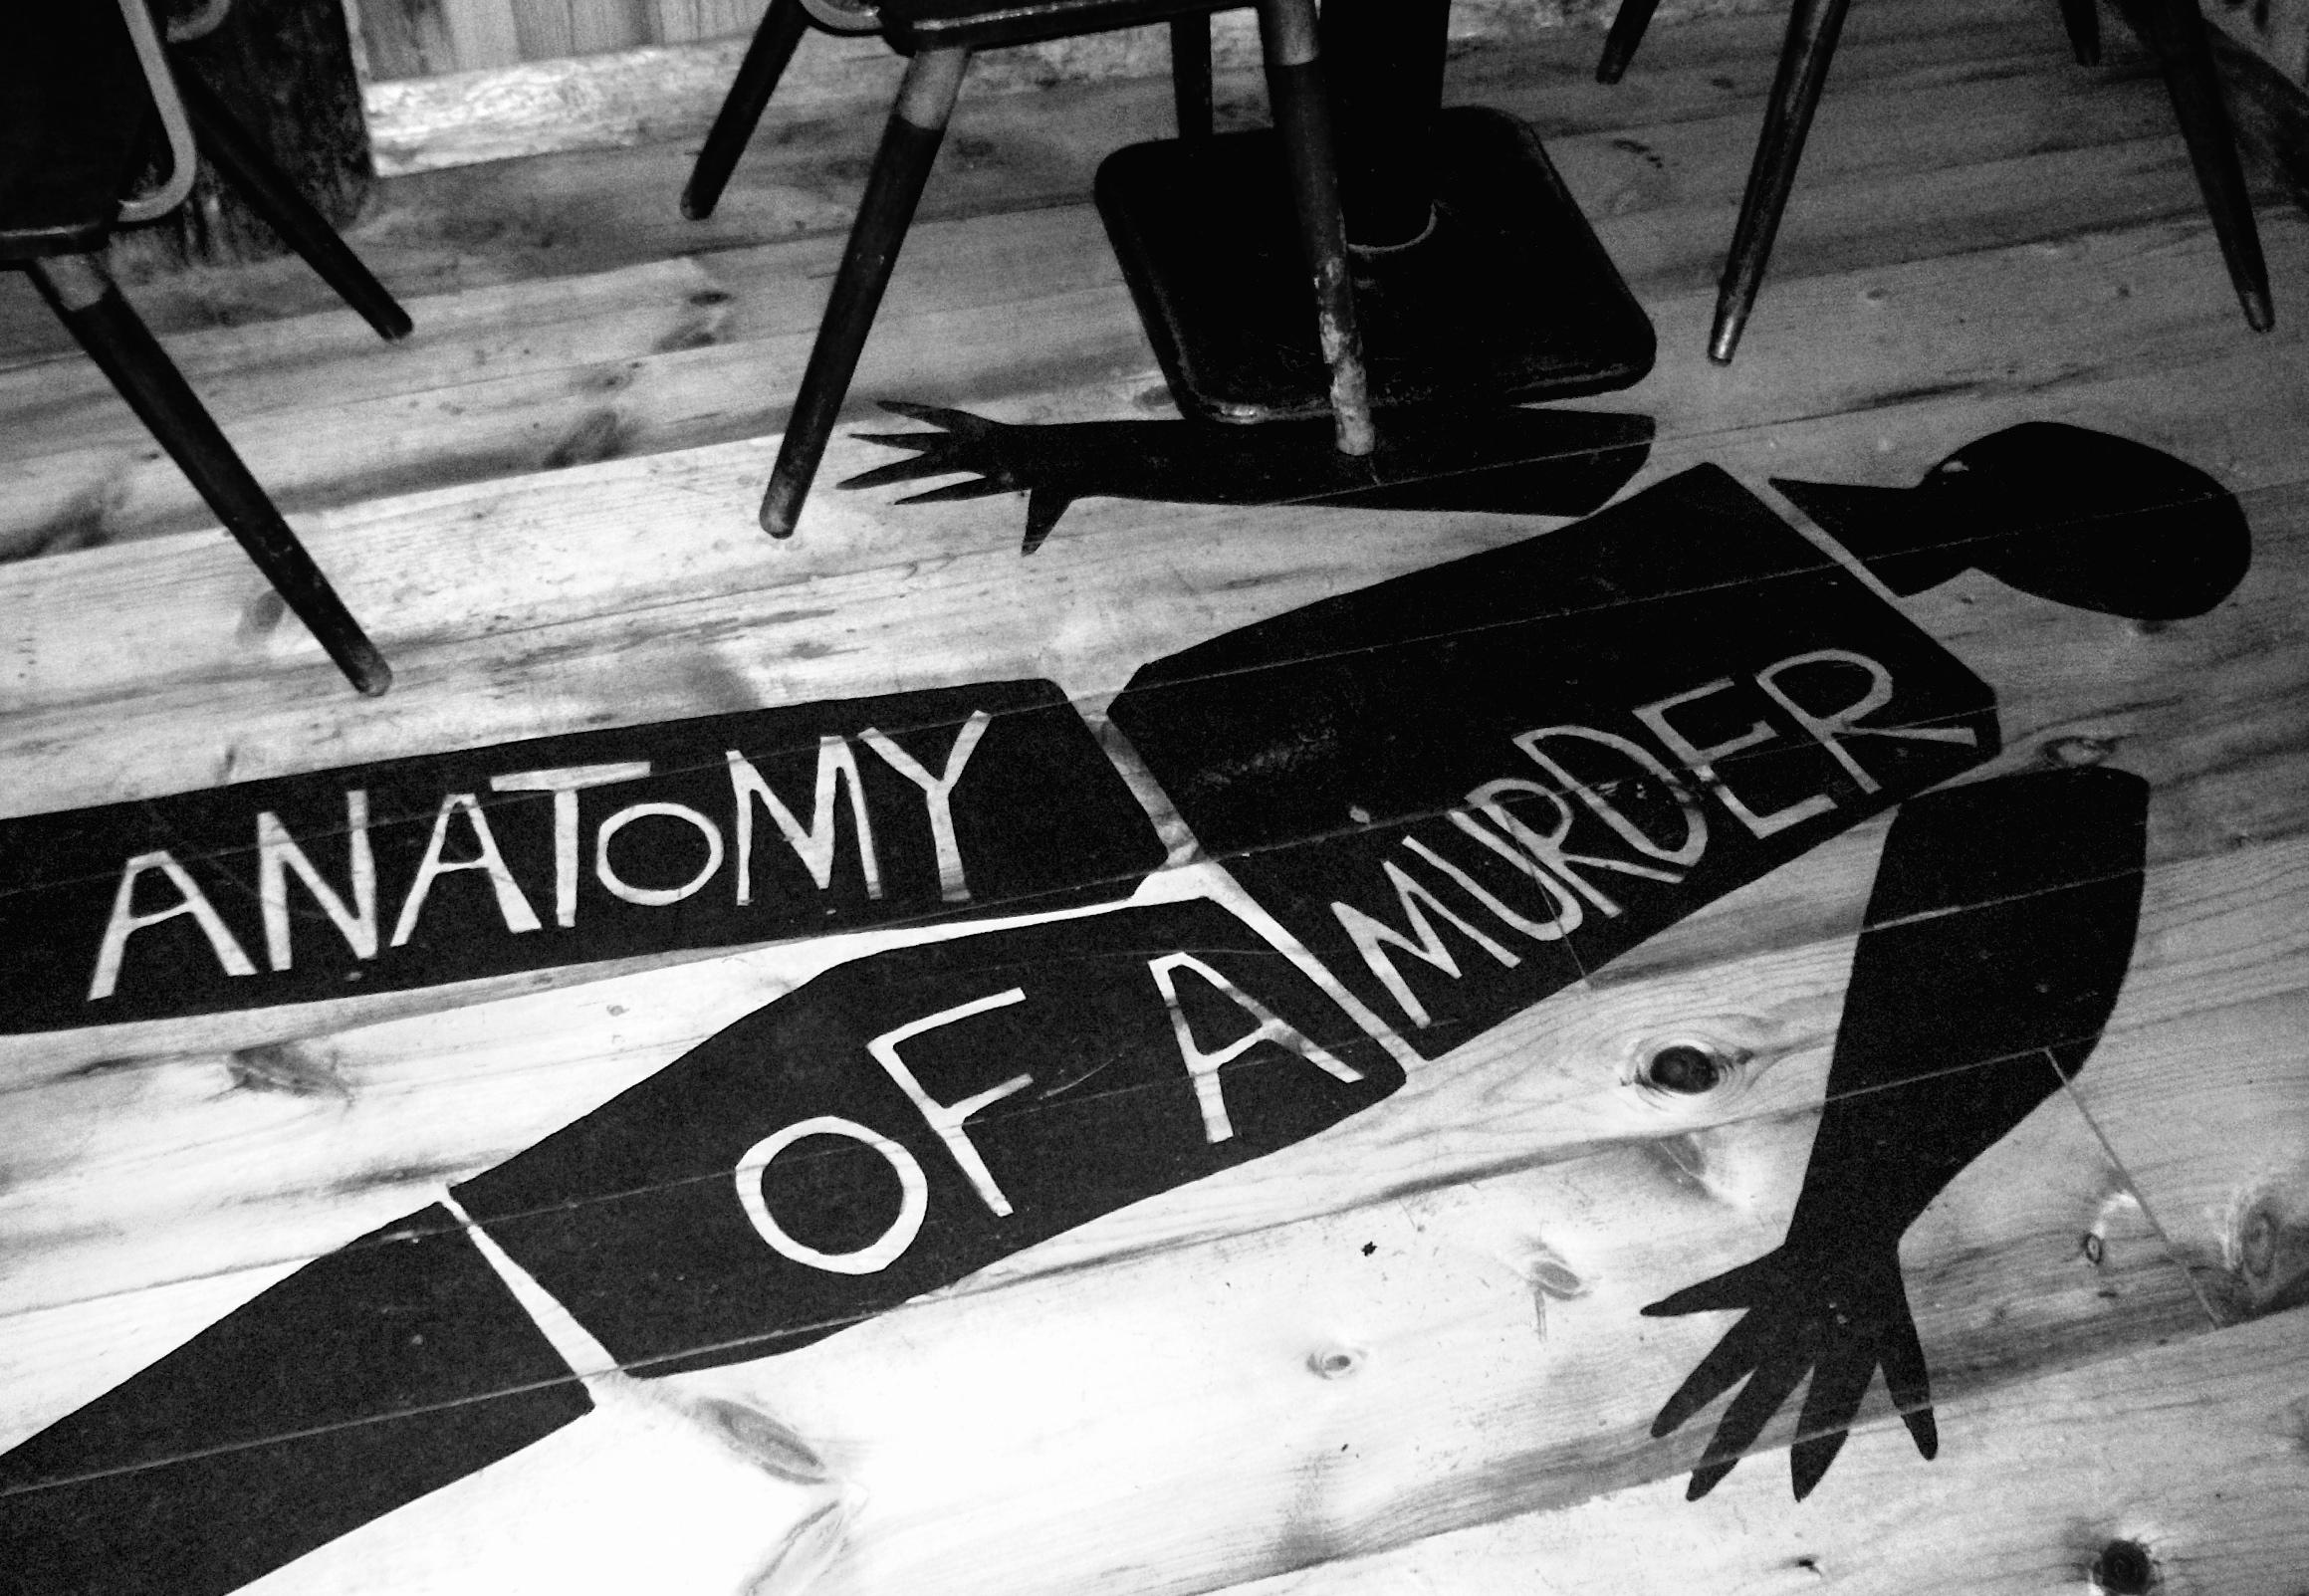 File:Anatomy of a Murder 2.jpg - Wikimedia Commons